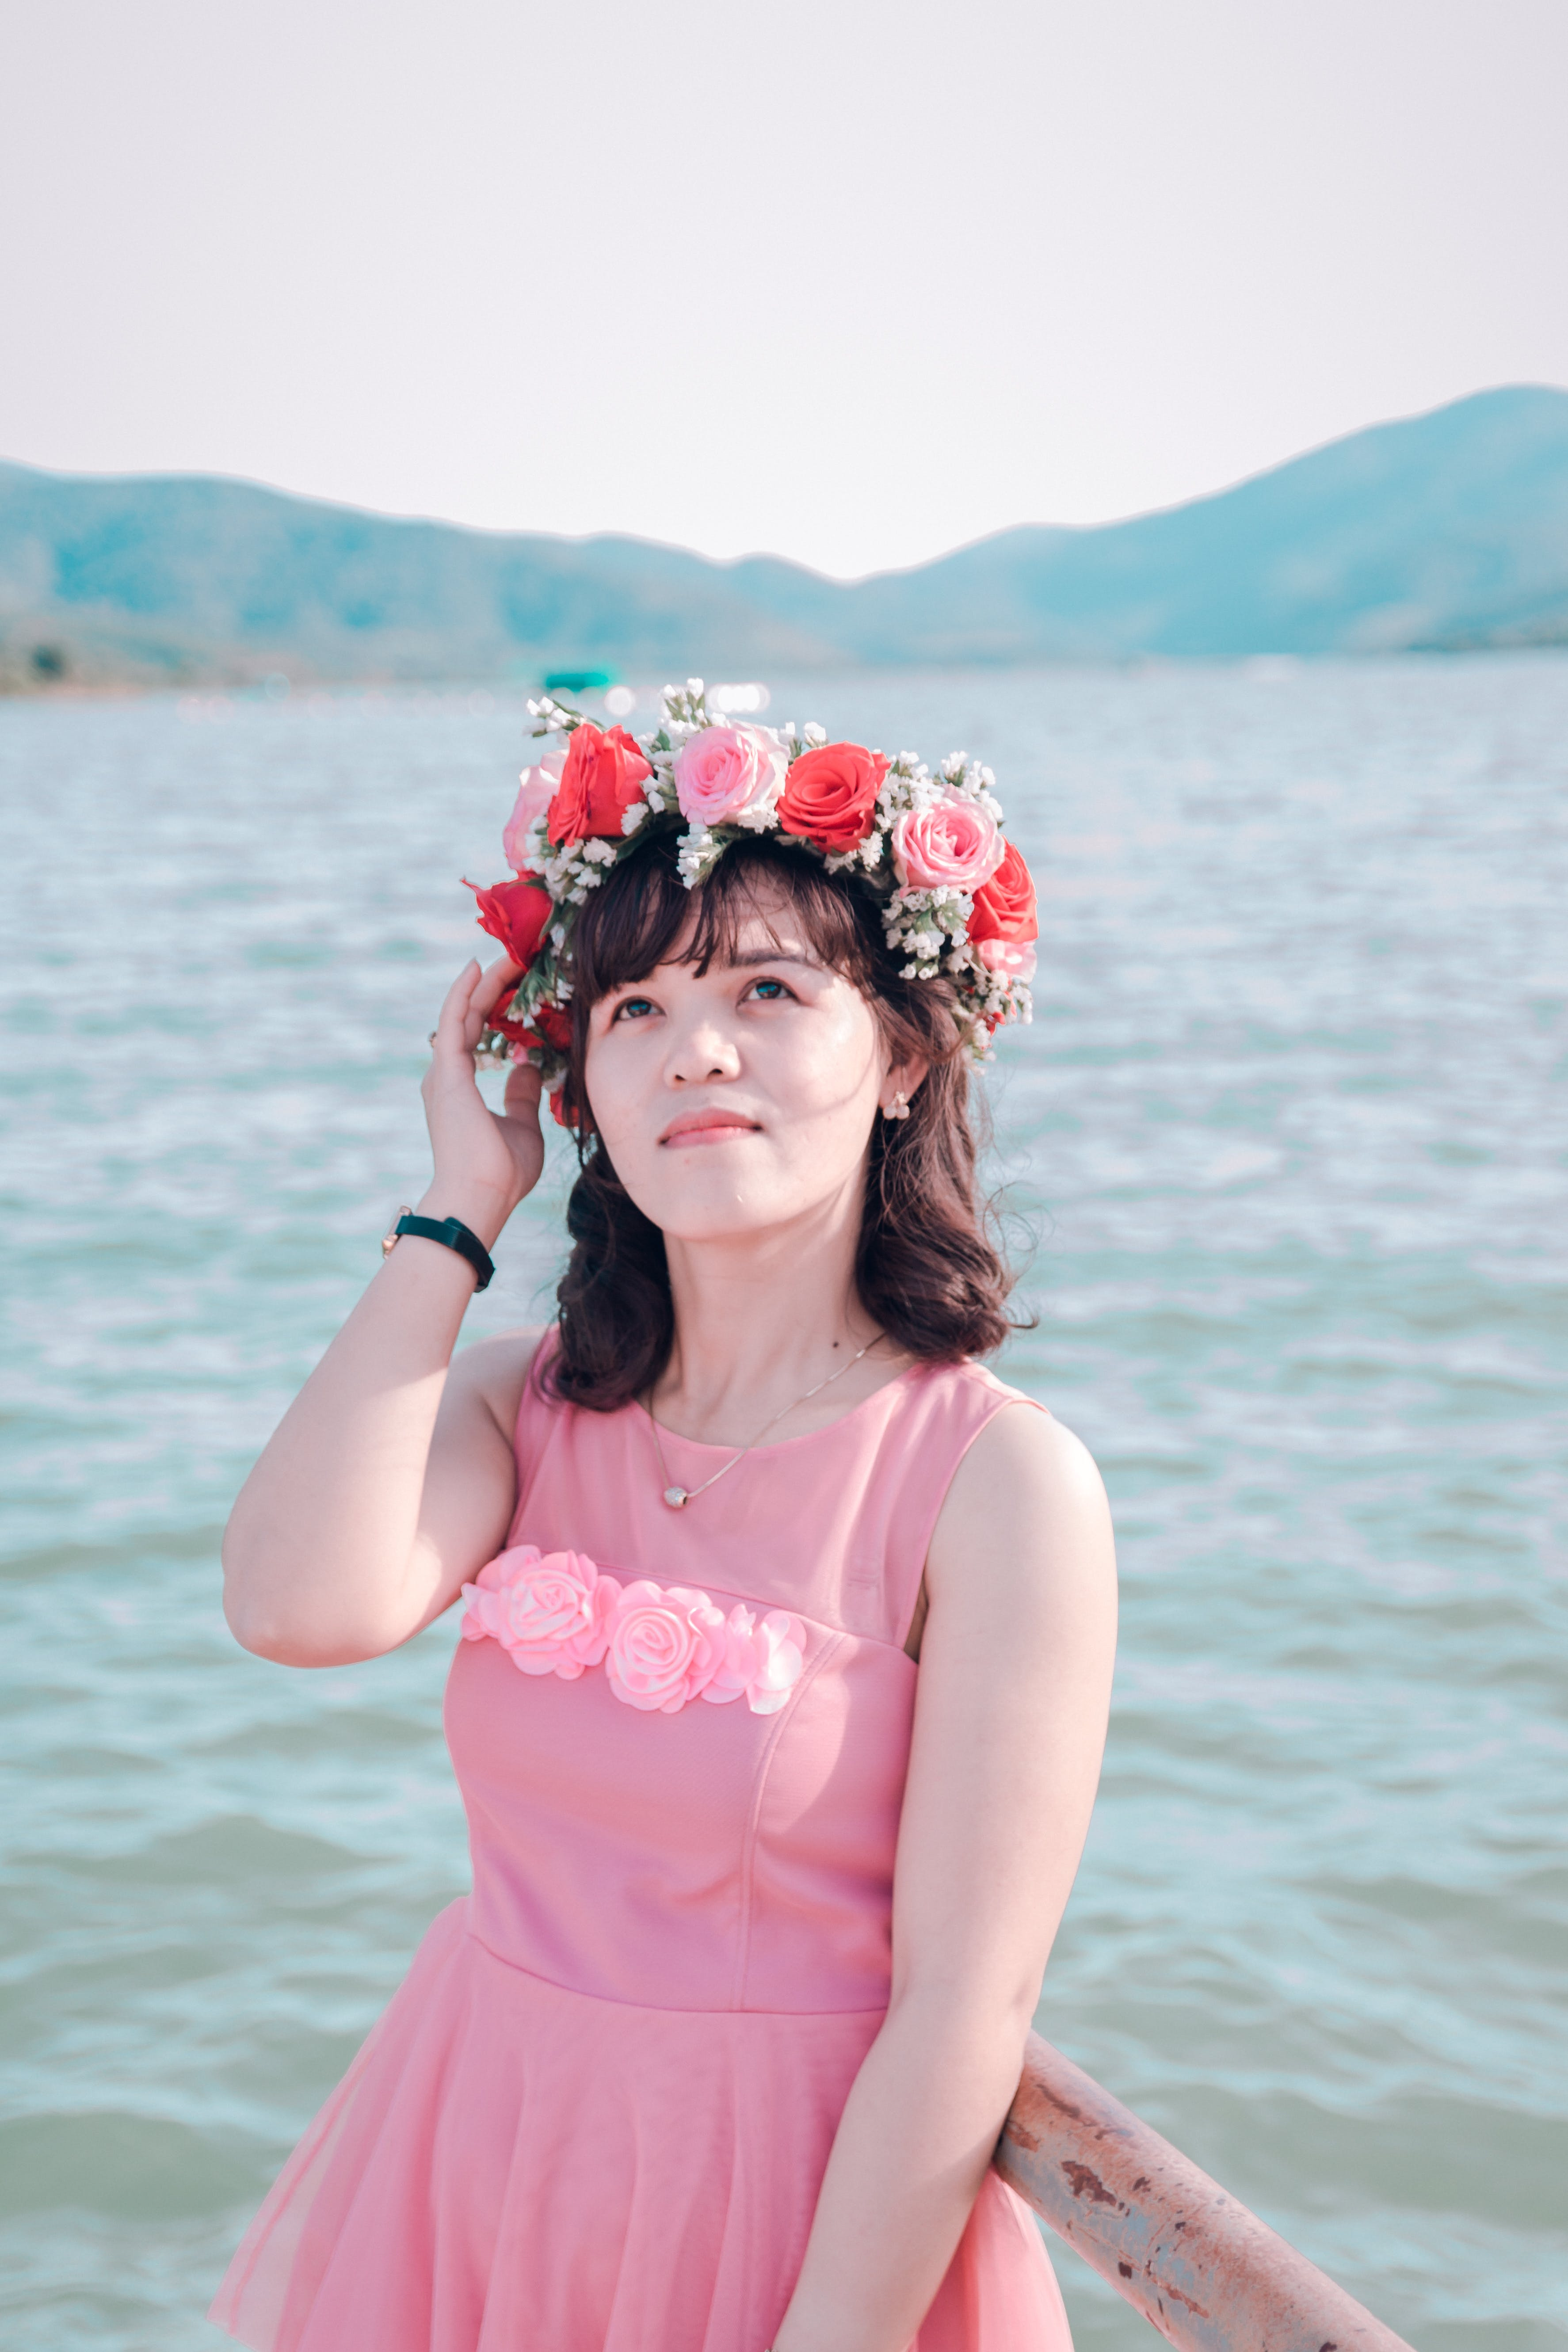 Woman Wearing Sleeveless Dress And Flower Headdress Near Body Of Water